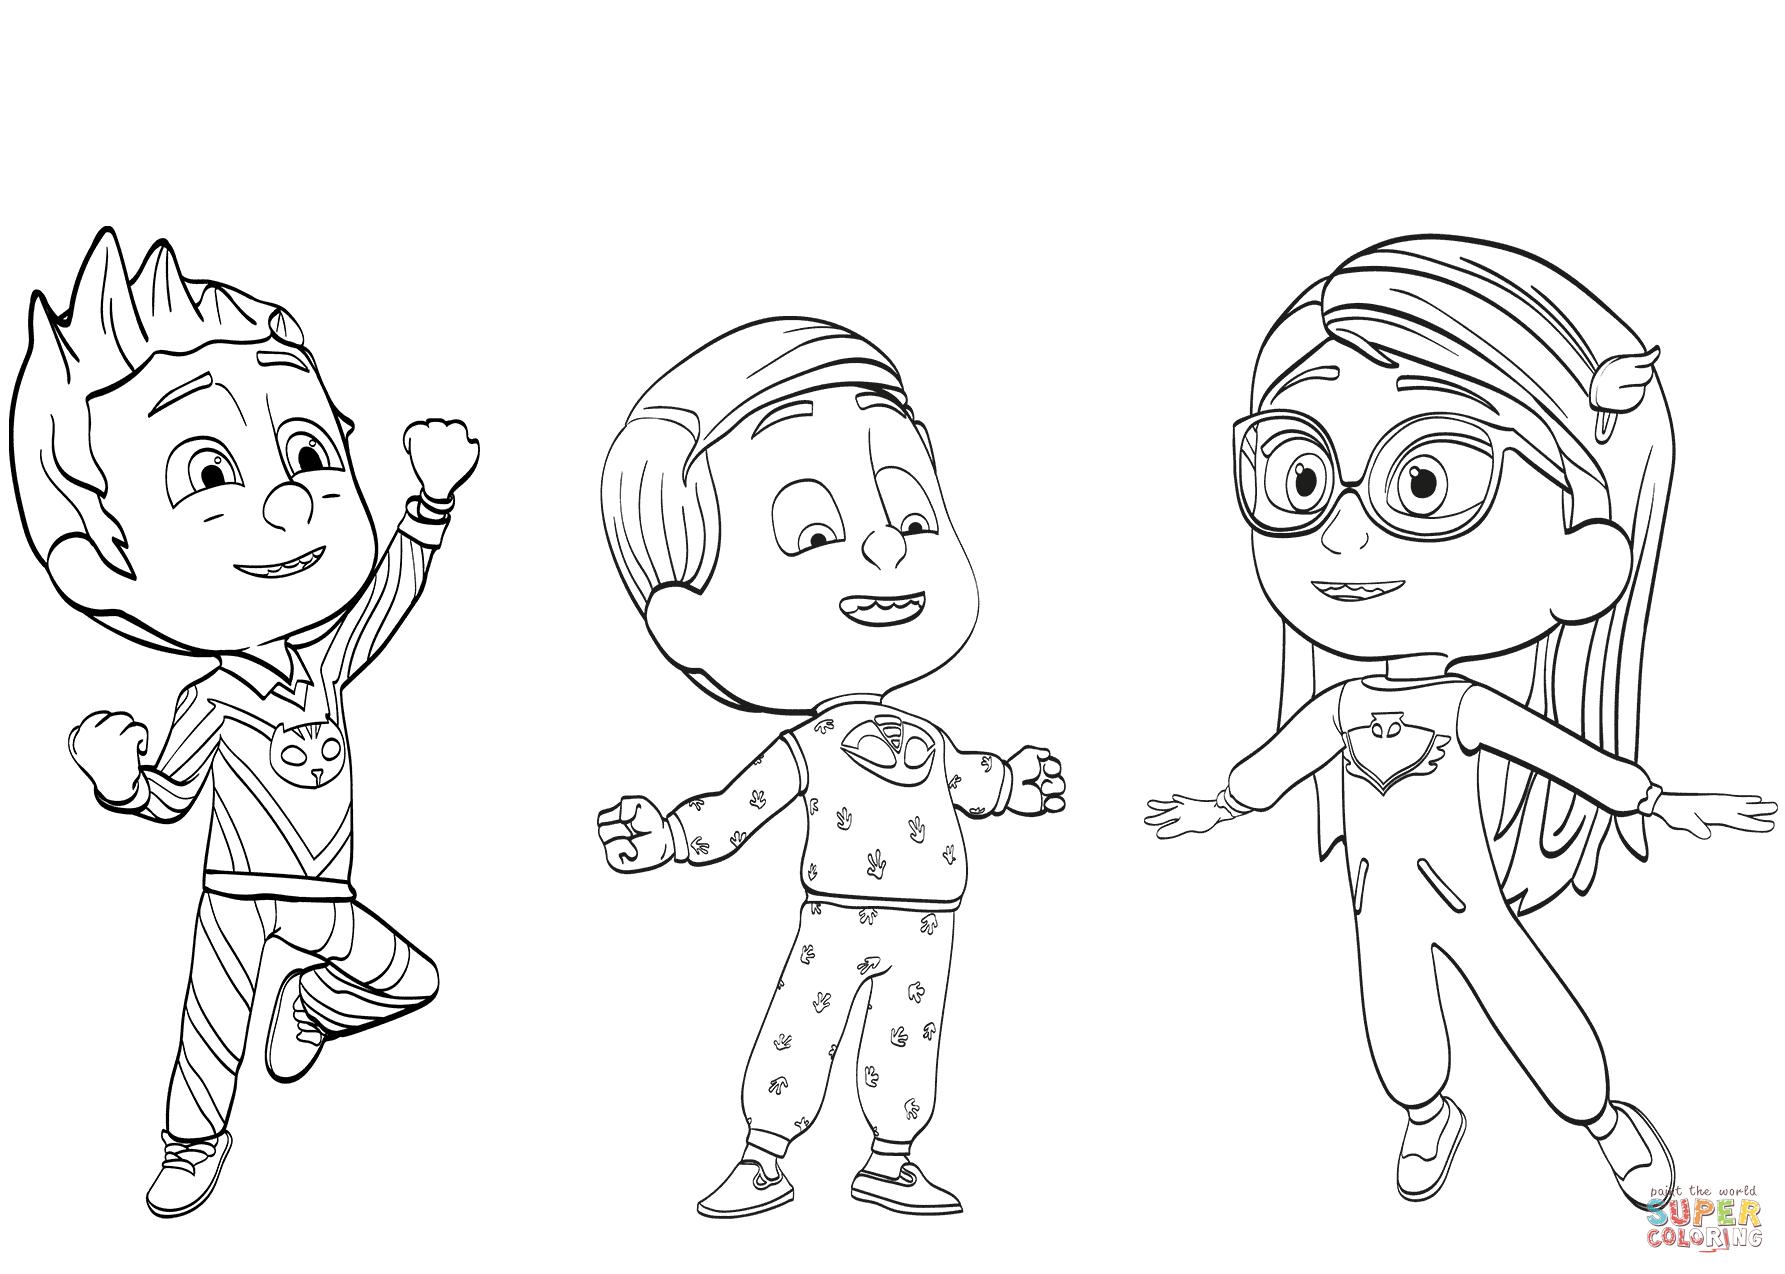 Pj Masks Pajama Heroes Coloring Page | Free Printable Coloring Pages - Free Printable Pajama Coloring Pages